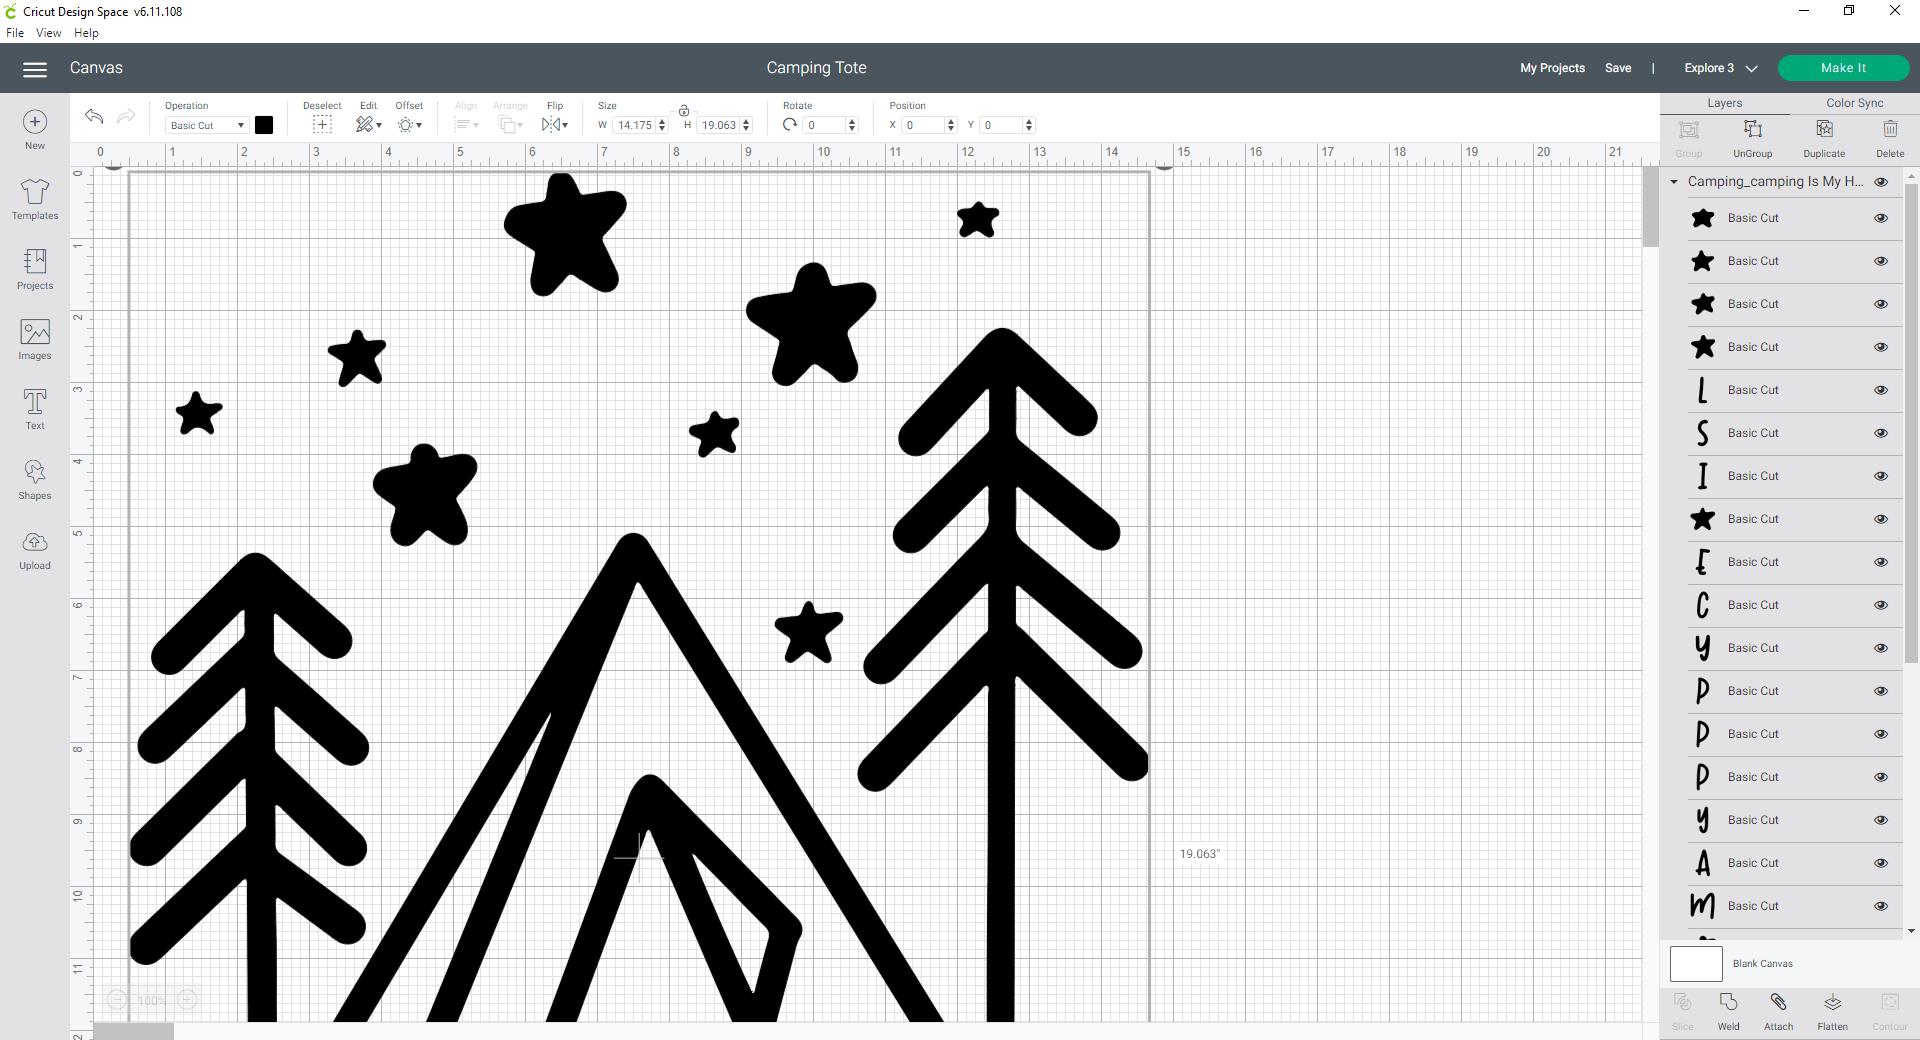 Cricut Design Space Insert SVG into canvas